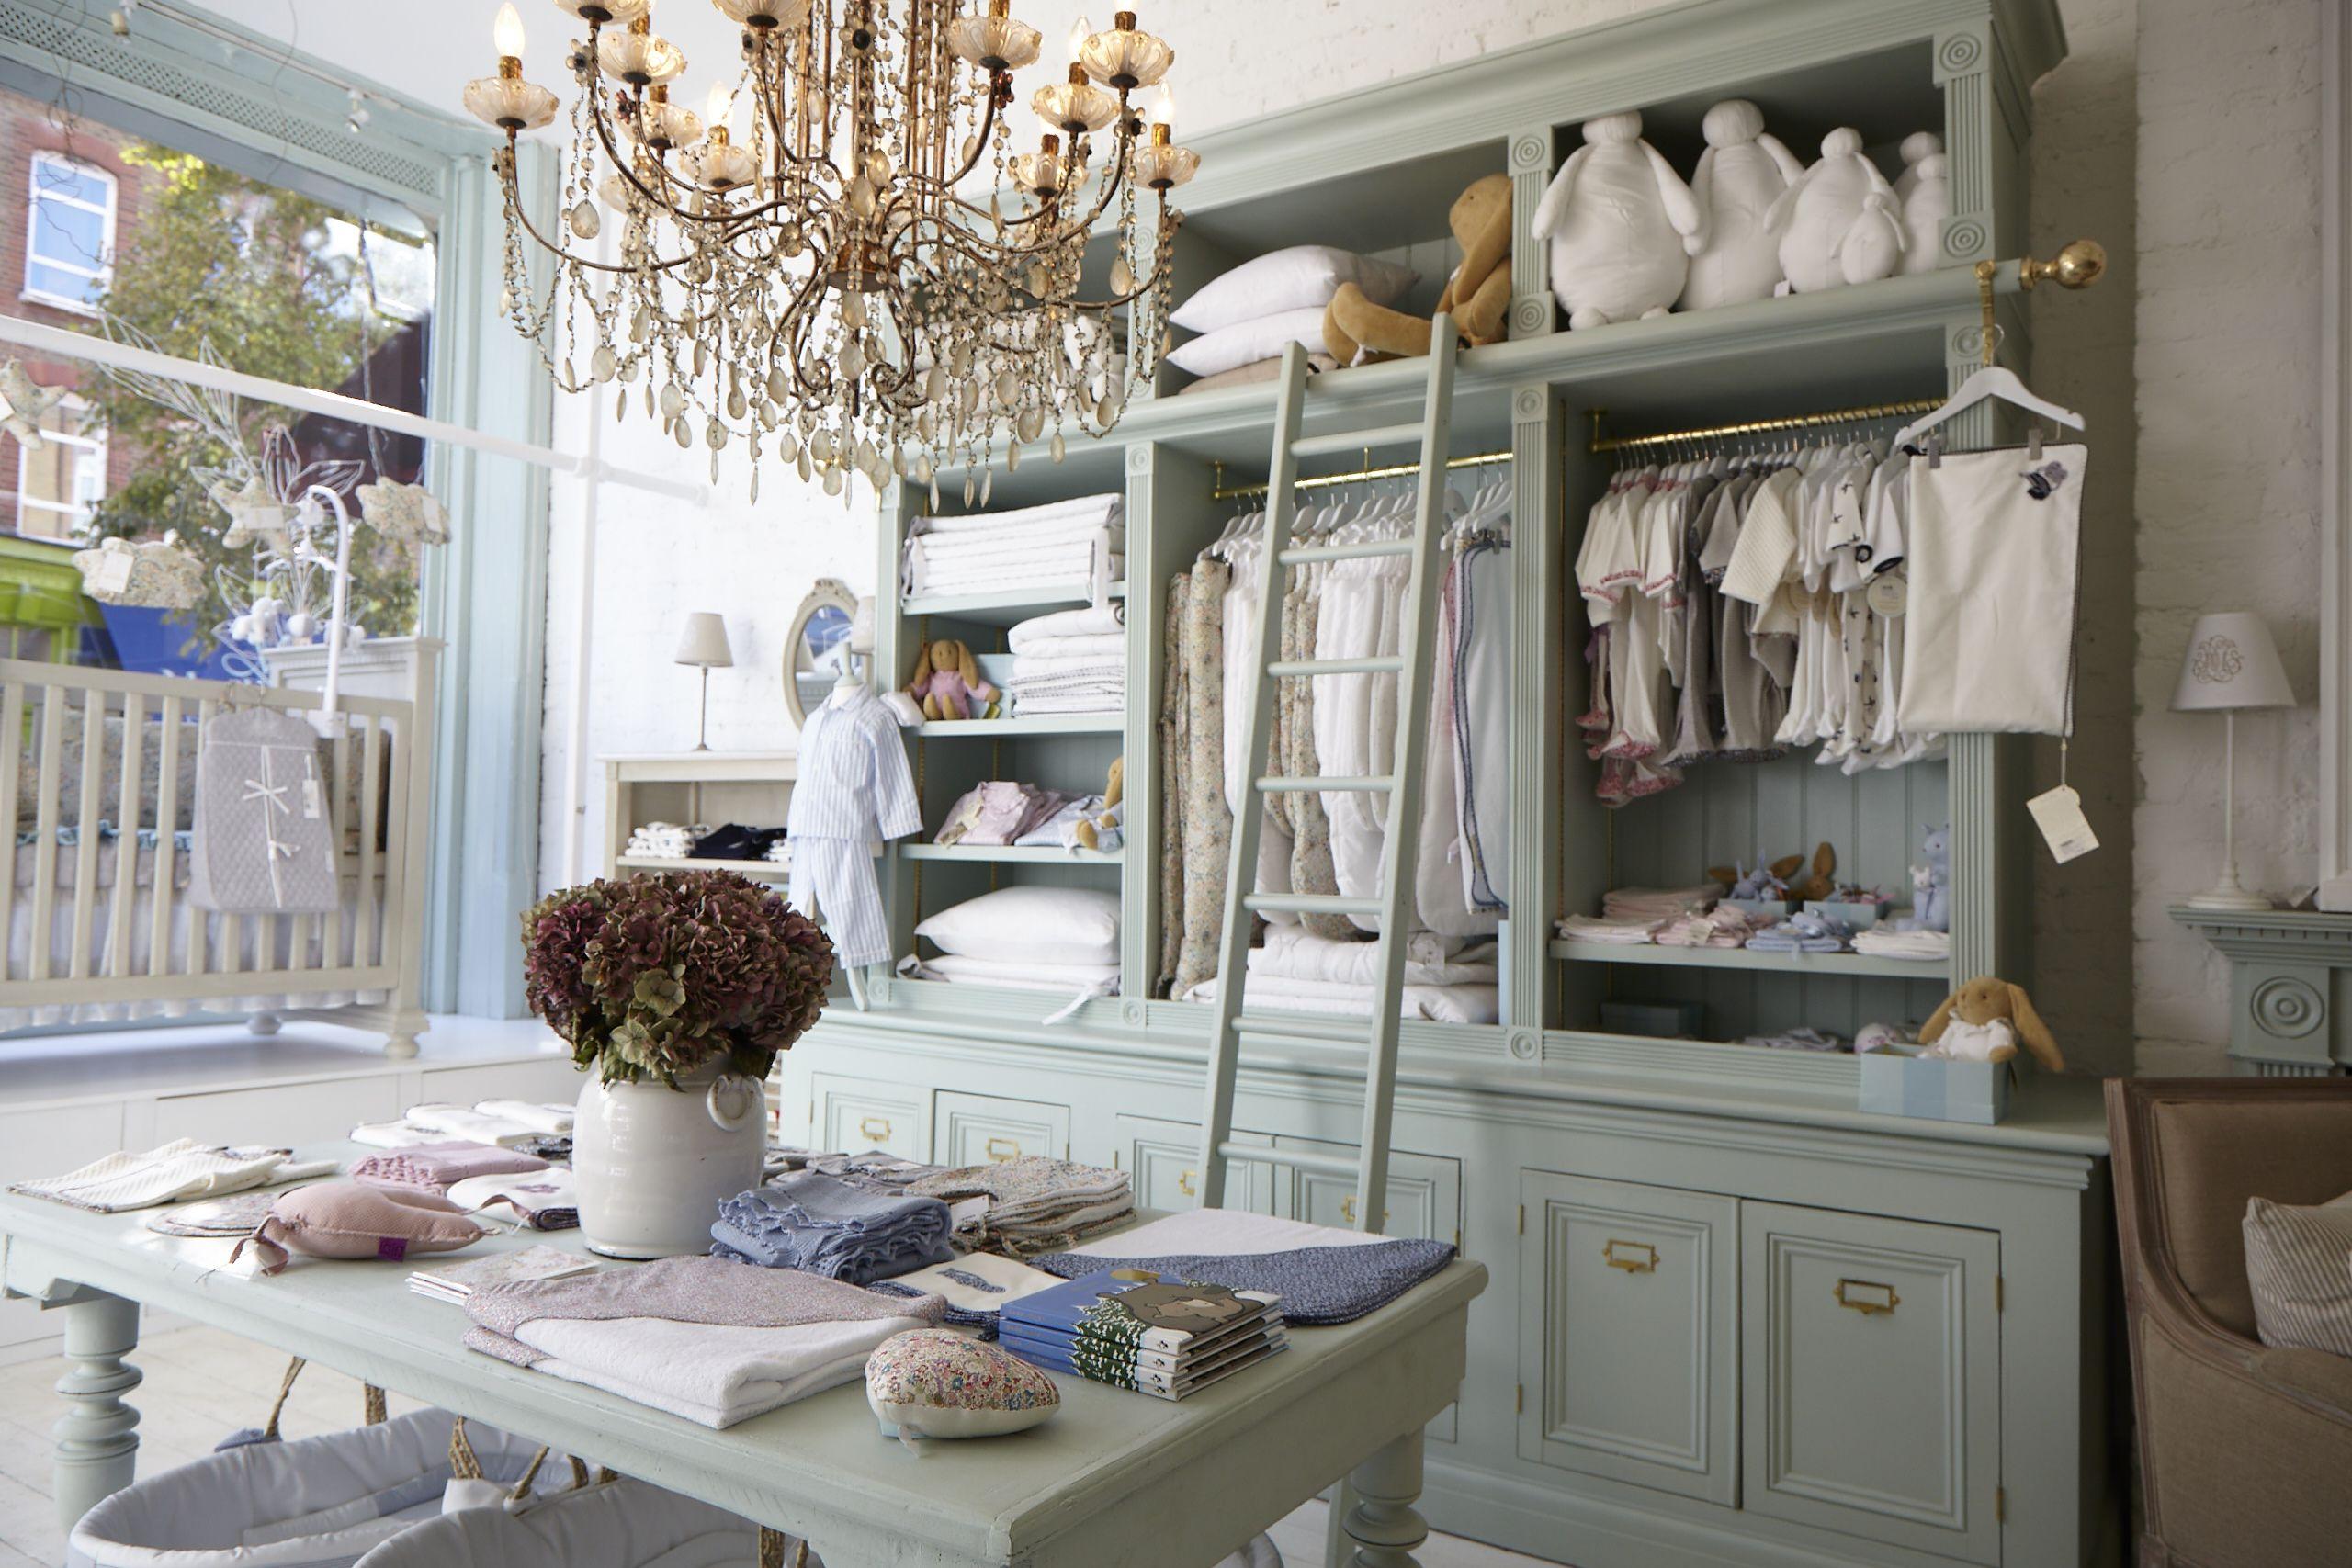 Piccoli & Co store | Retail/Wholesale Display | Pinterest | Tiendas ...